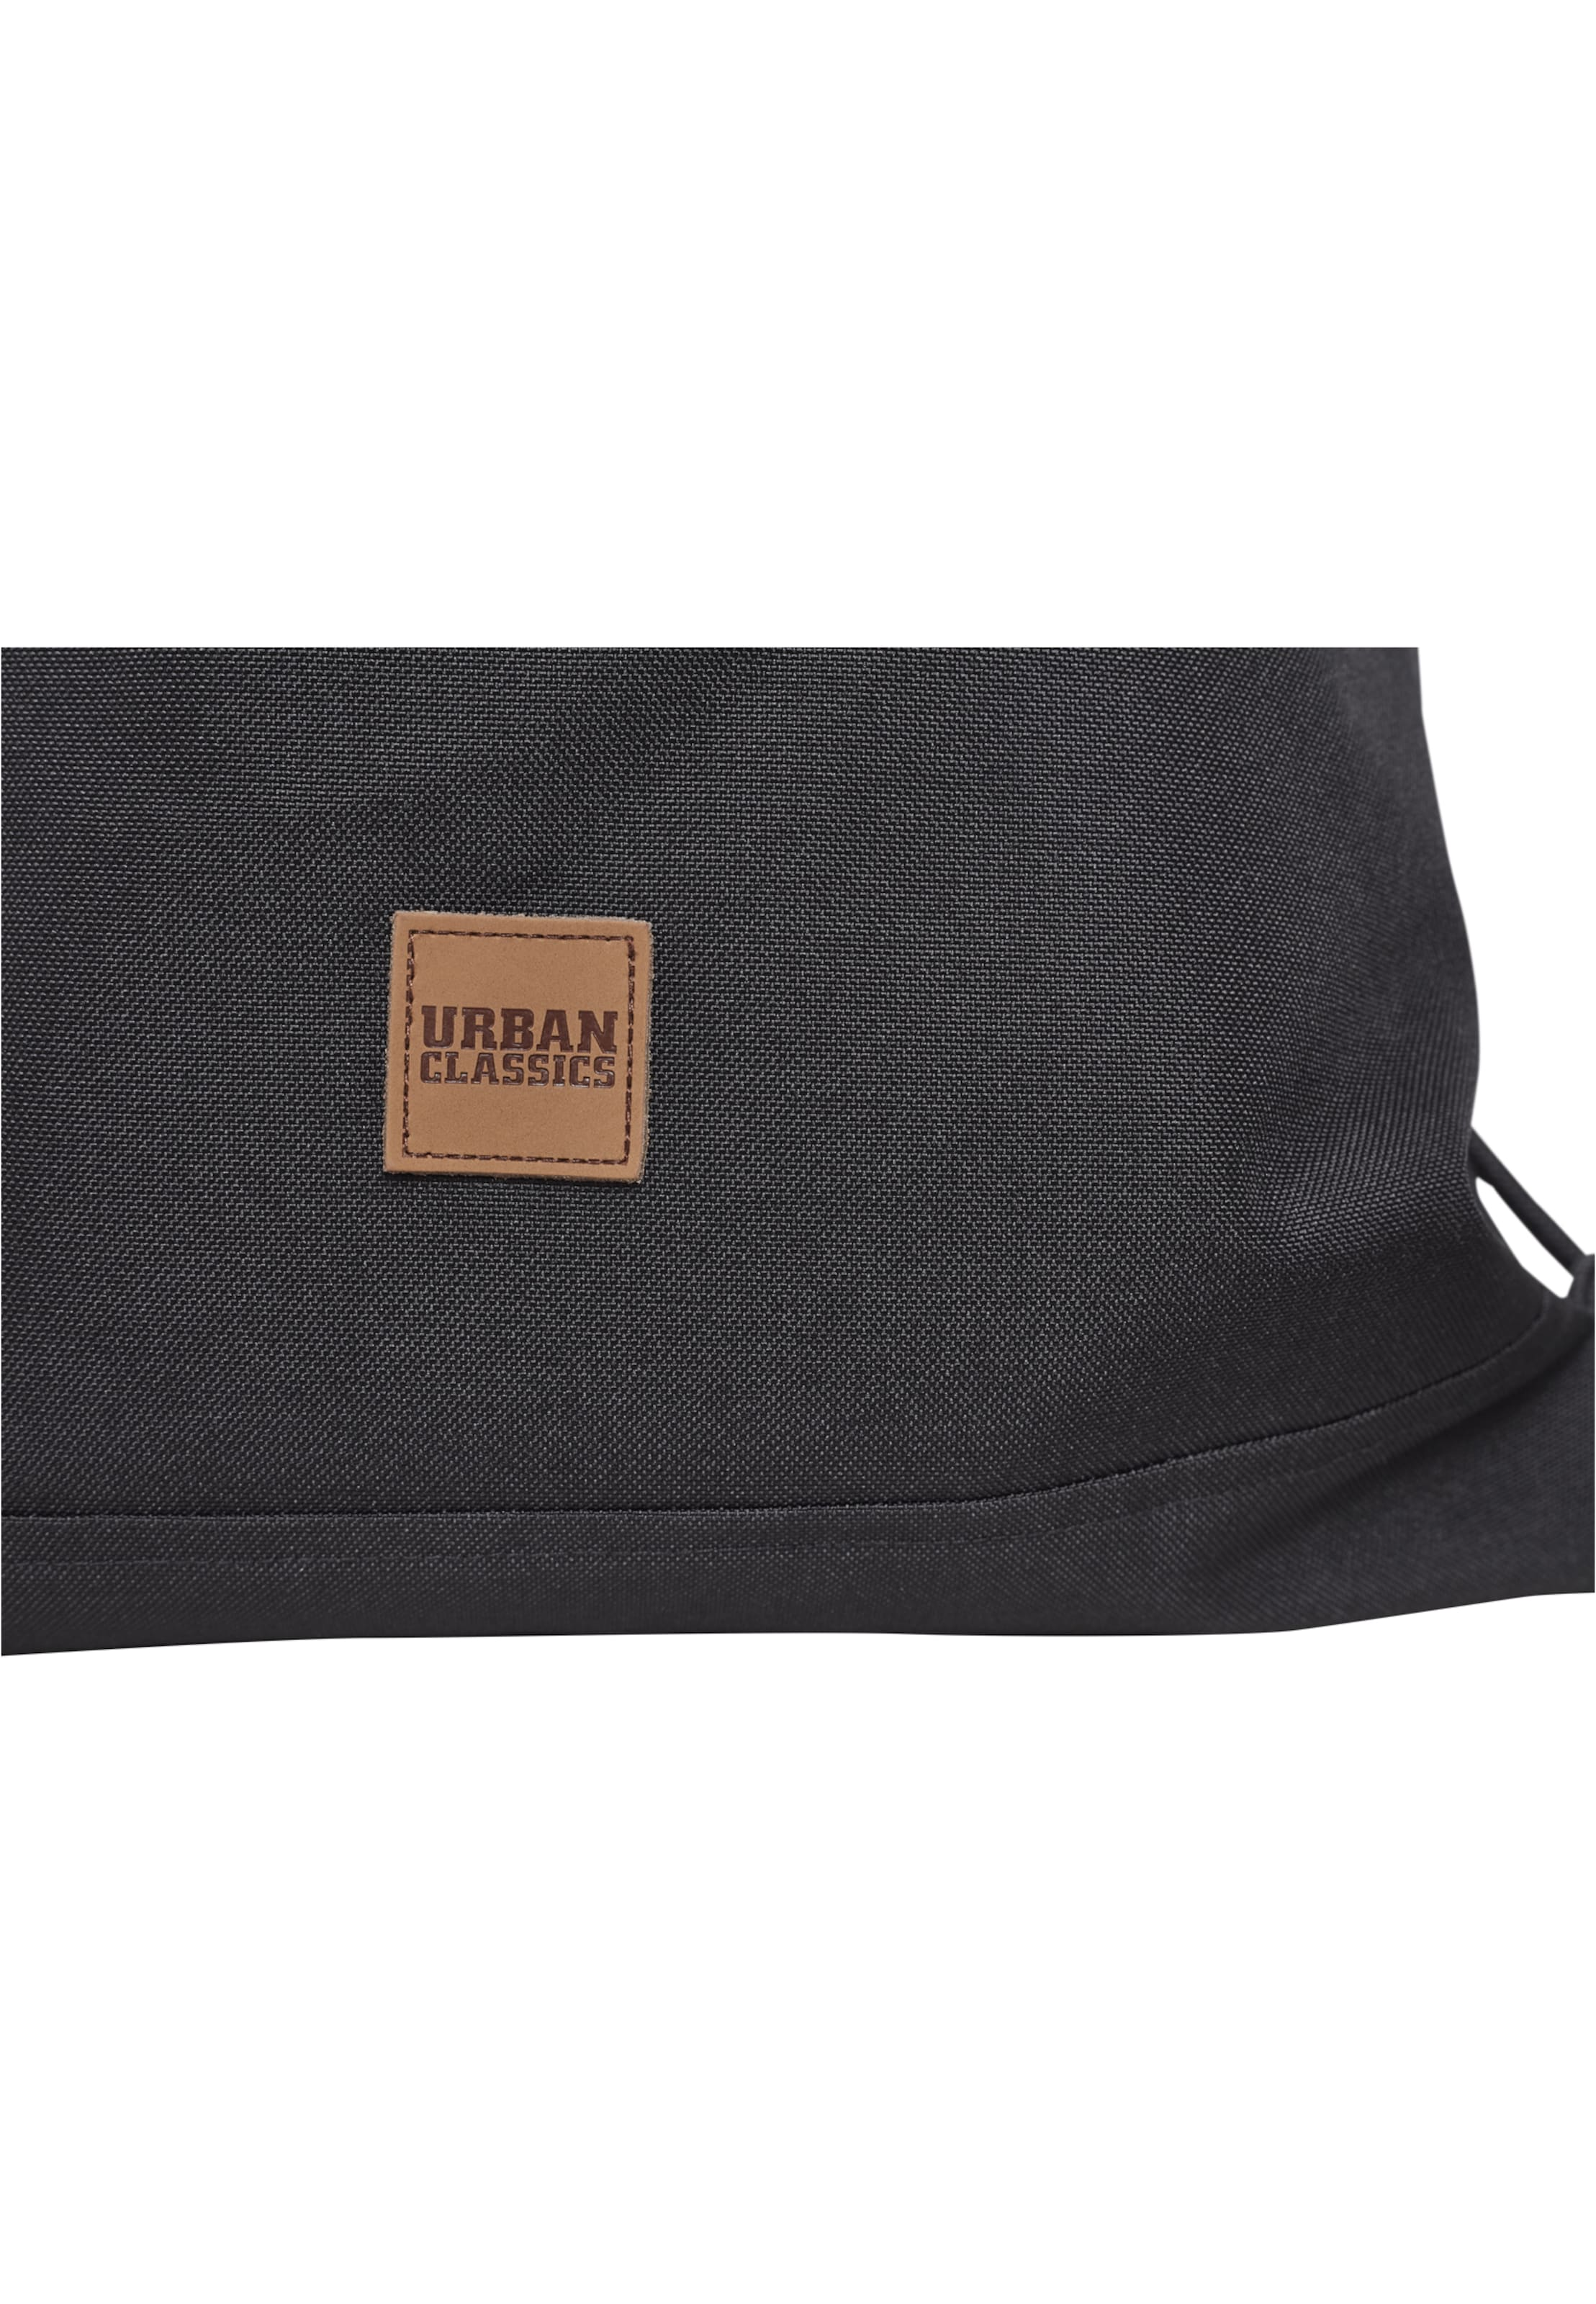 In Bag Bag Classics Classics In Schwarz Urban Urban Schwarz c345RLAjqS